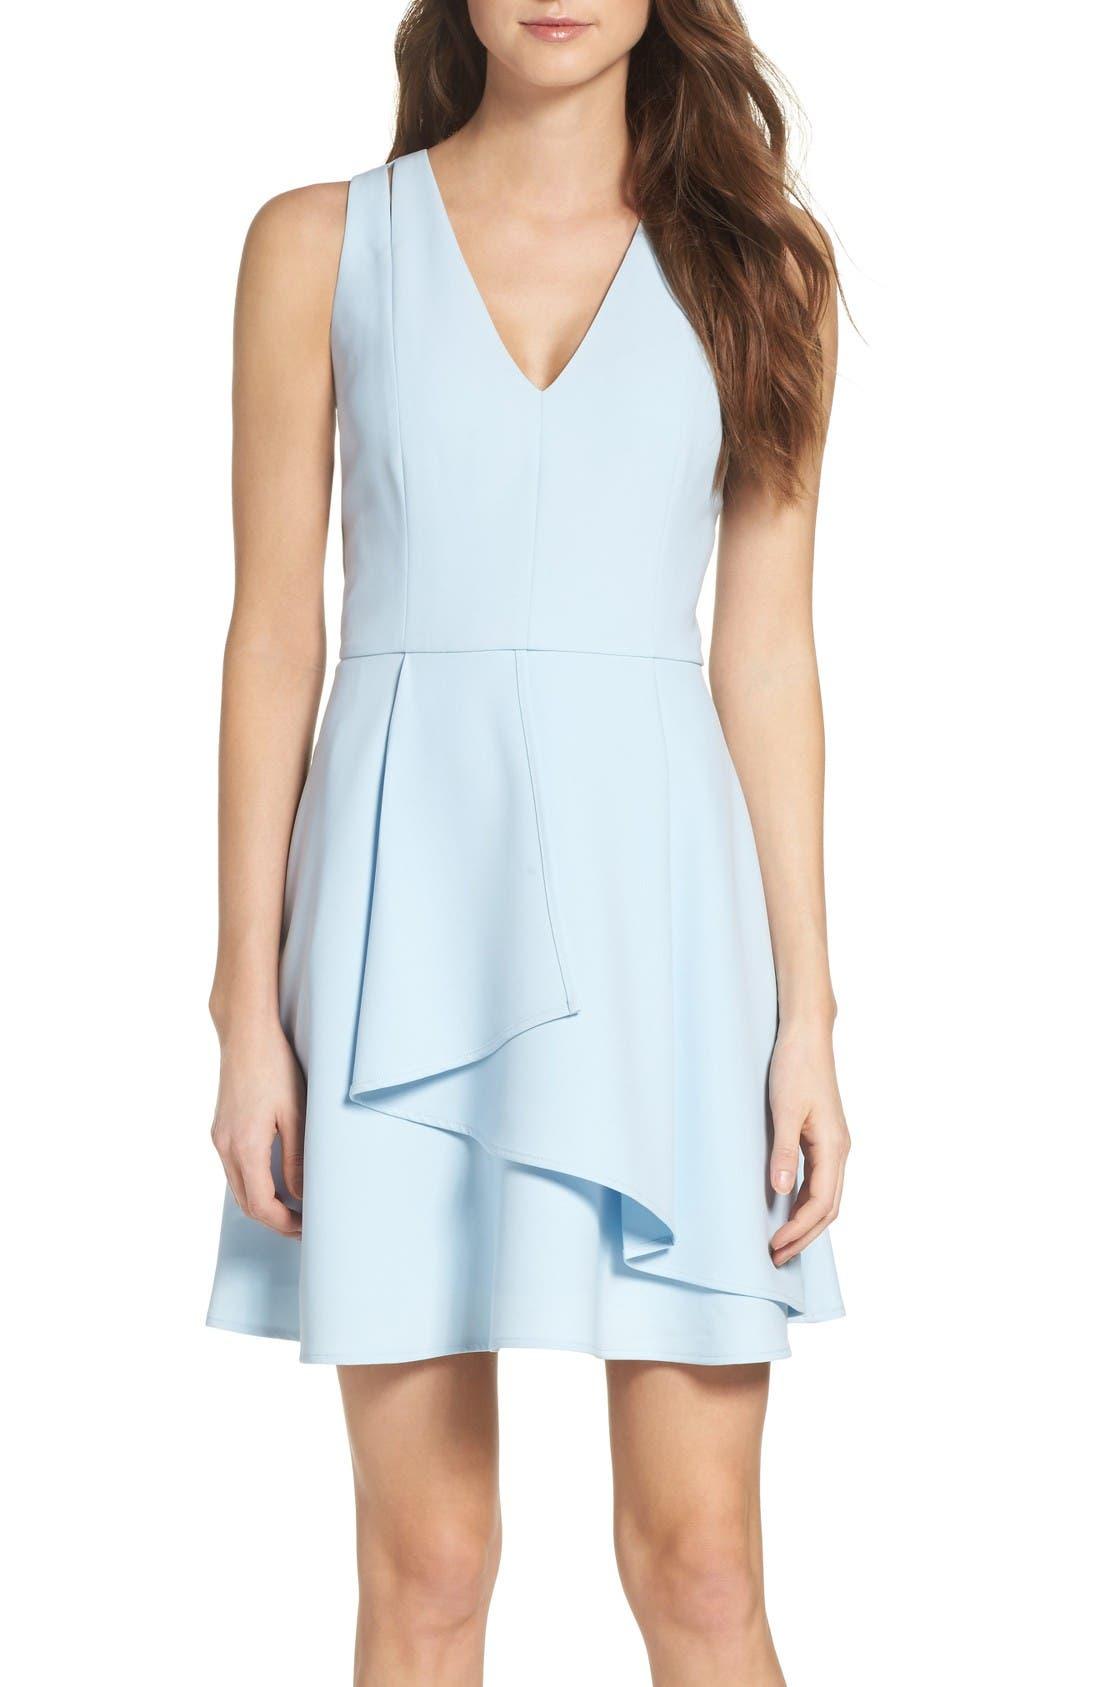 Asymmetrical Cream Dresses